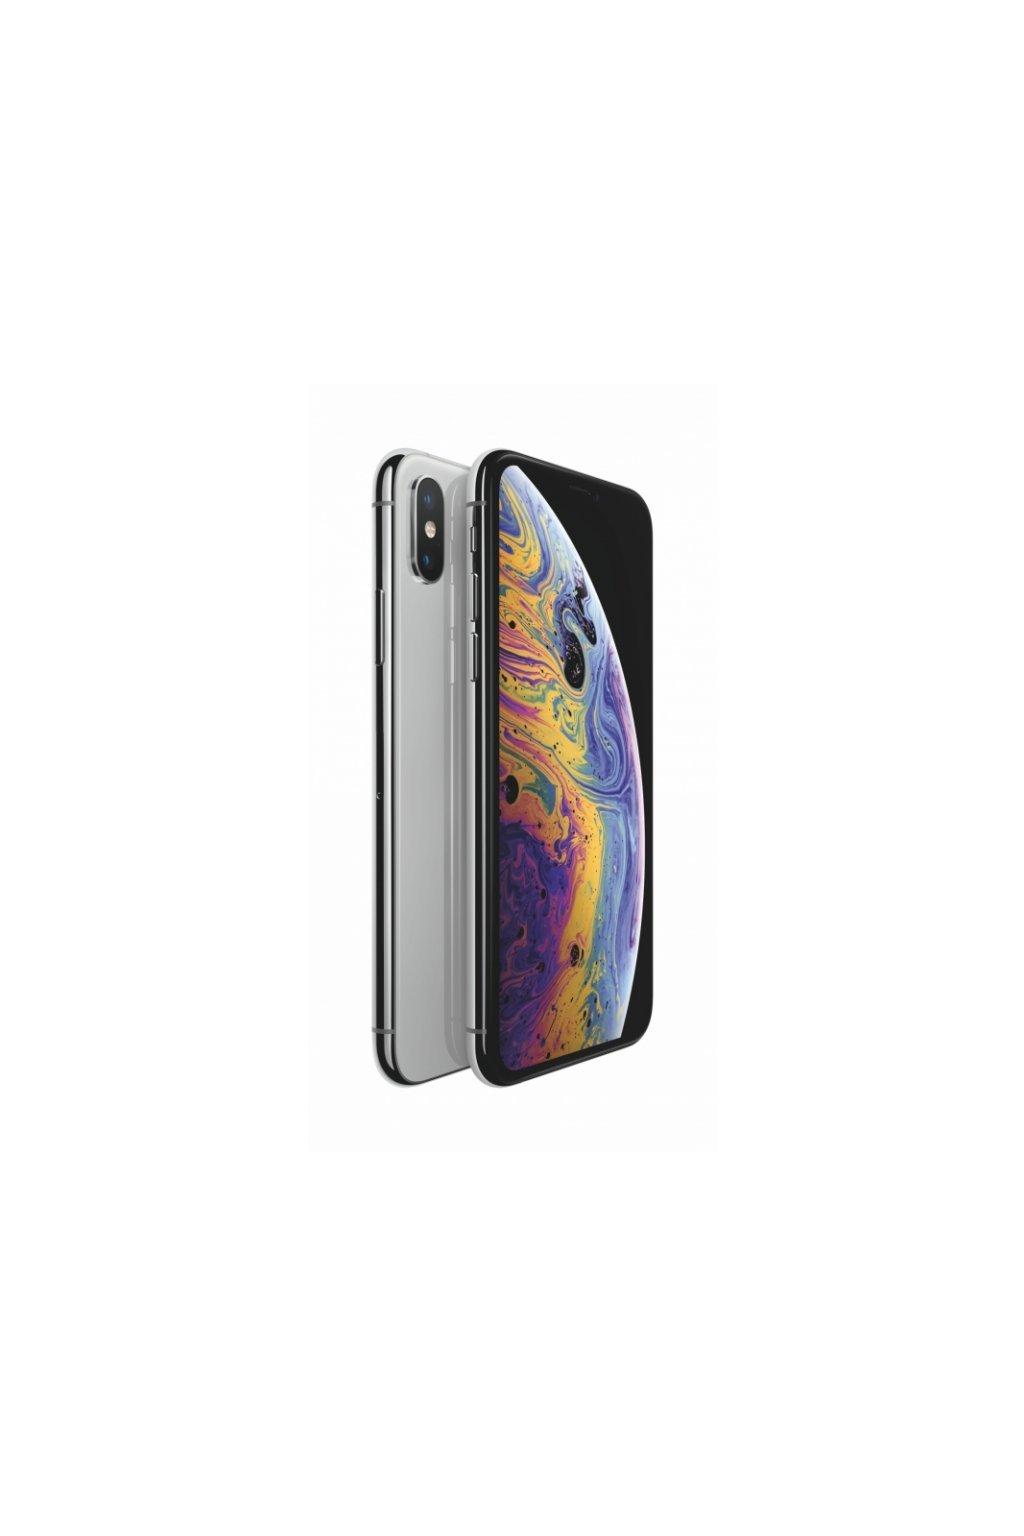 69 iphone xs 2